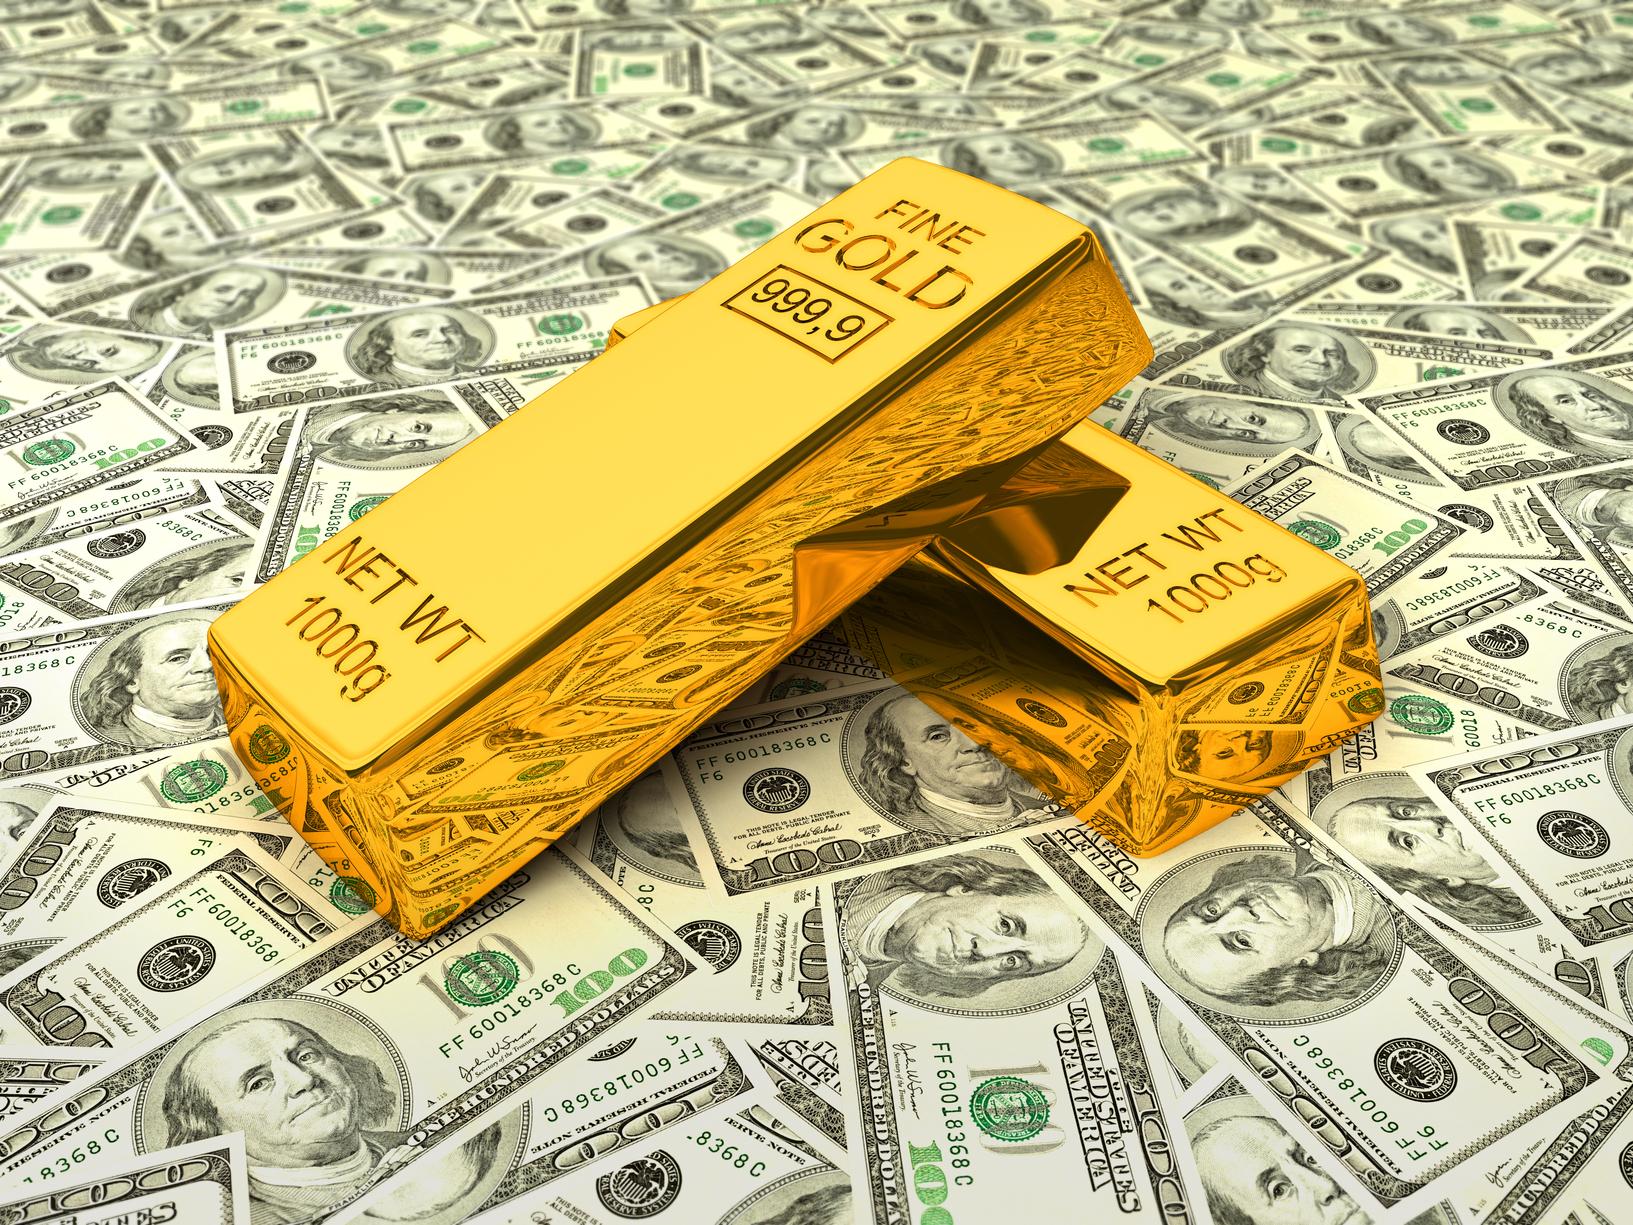 buy nairobi gold